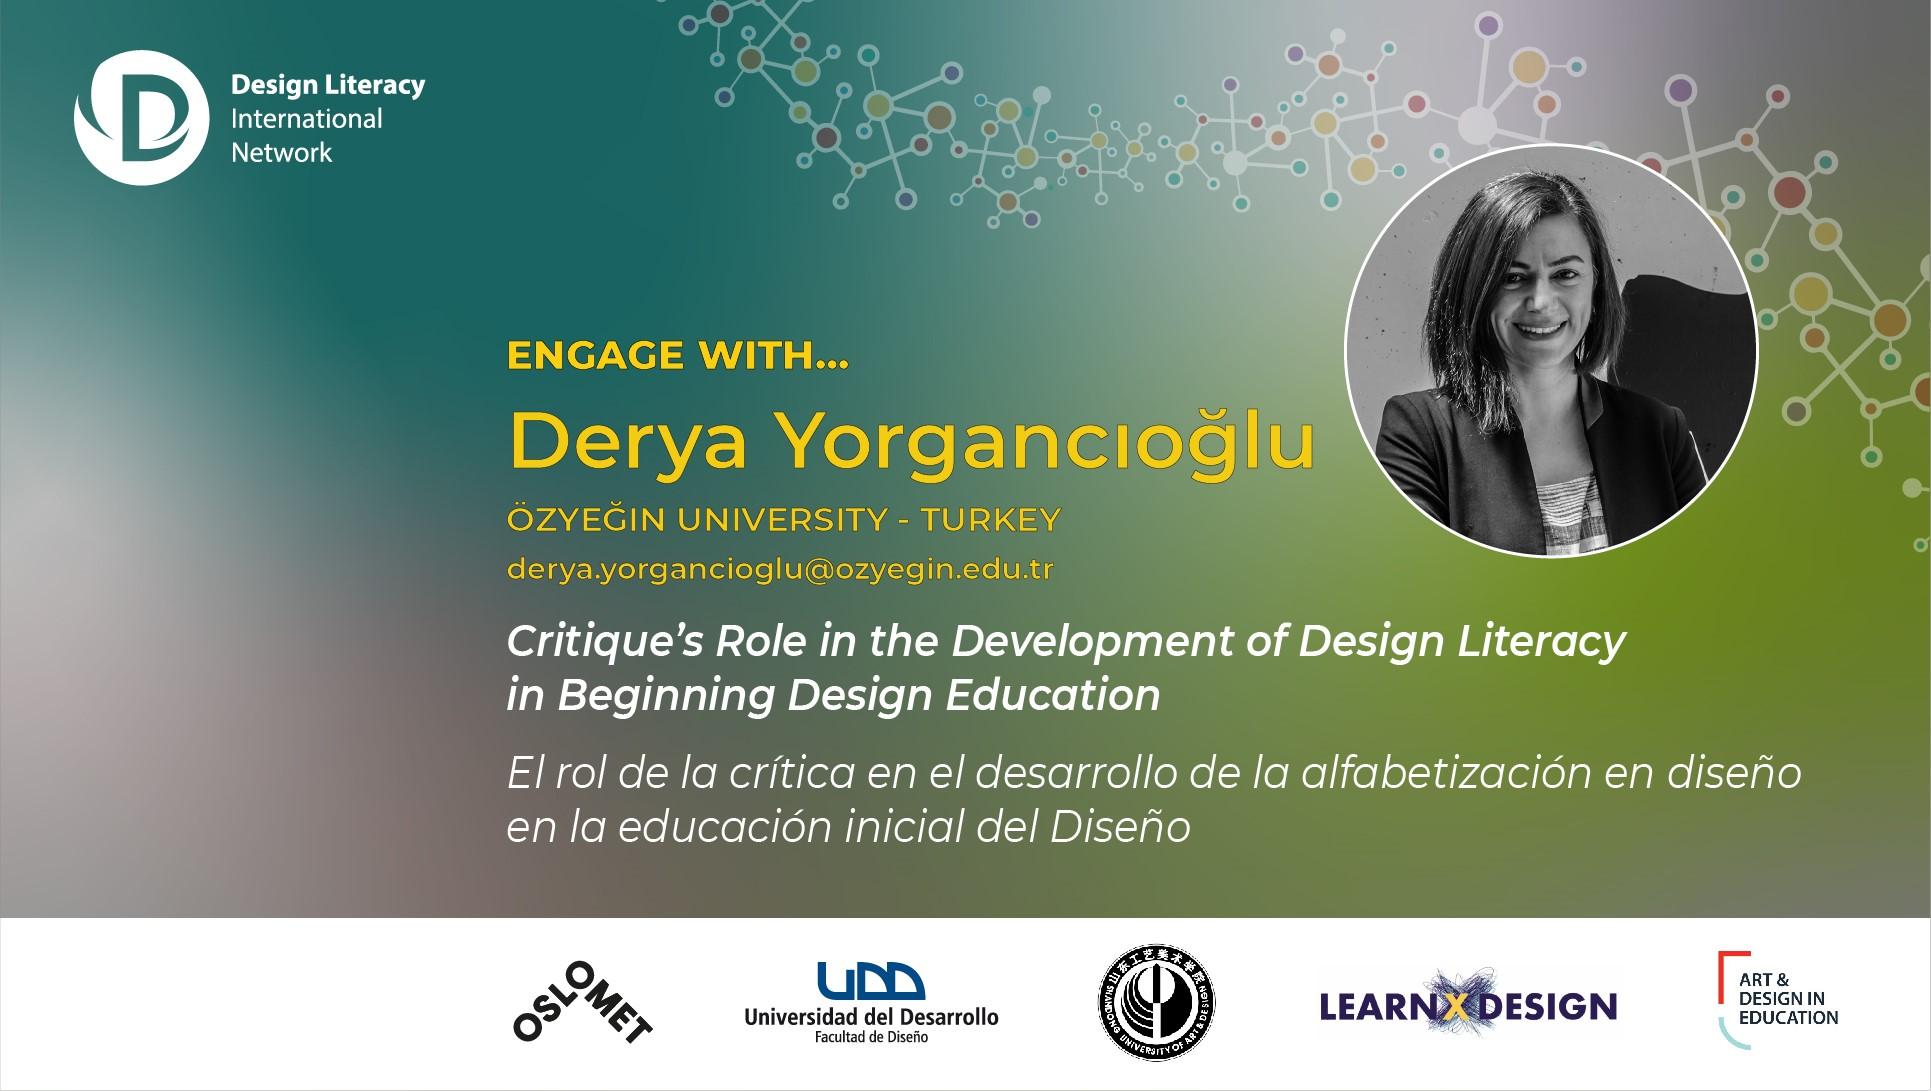 Engage with Derya Yorgancıoğlu | Event Archive